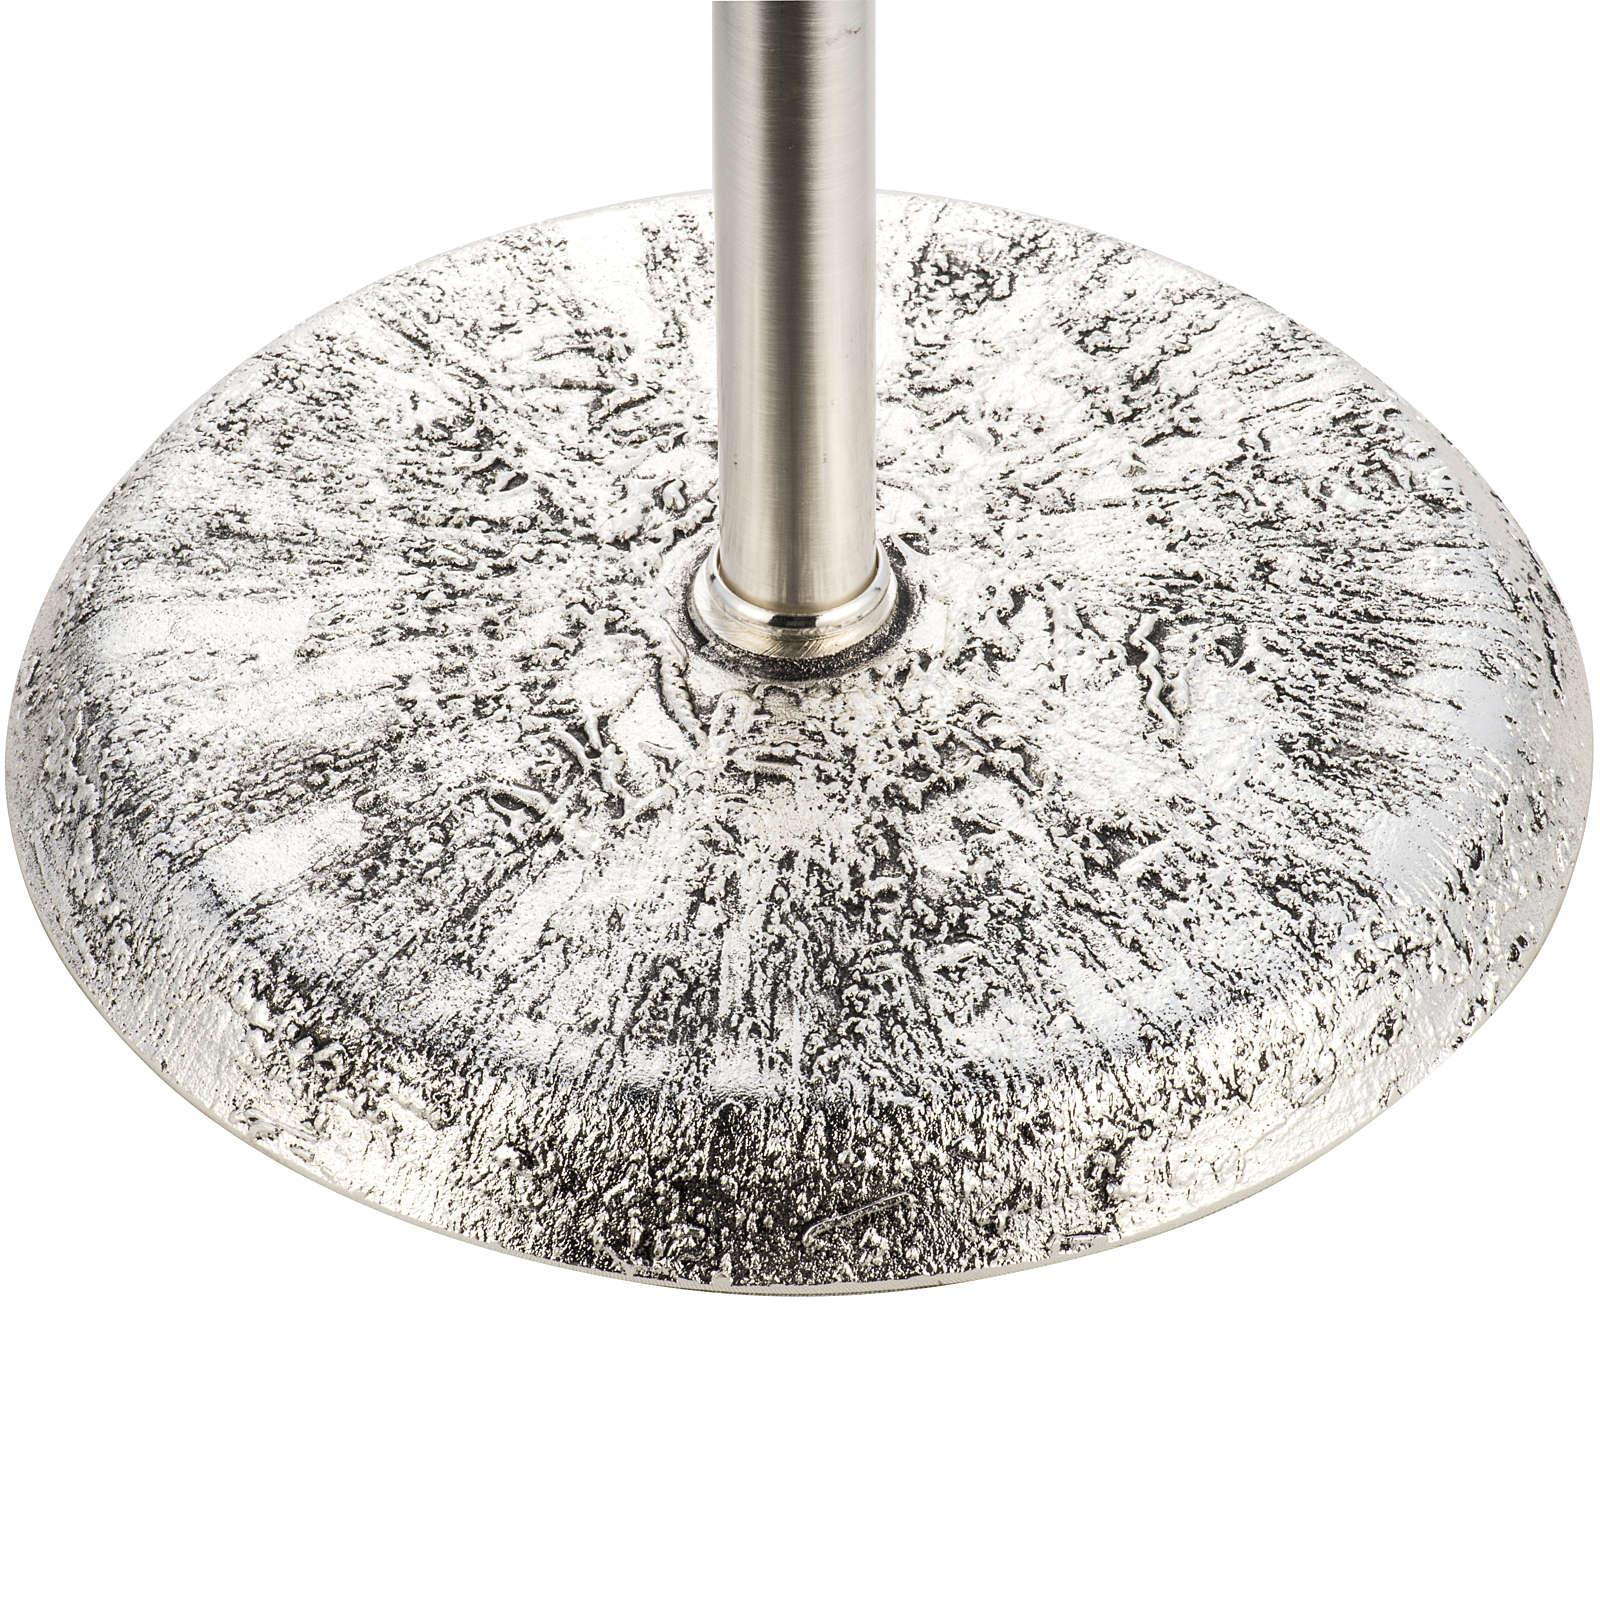 Porte-encensoir en laiton fondu 3